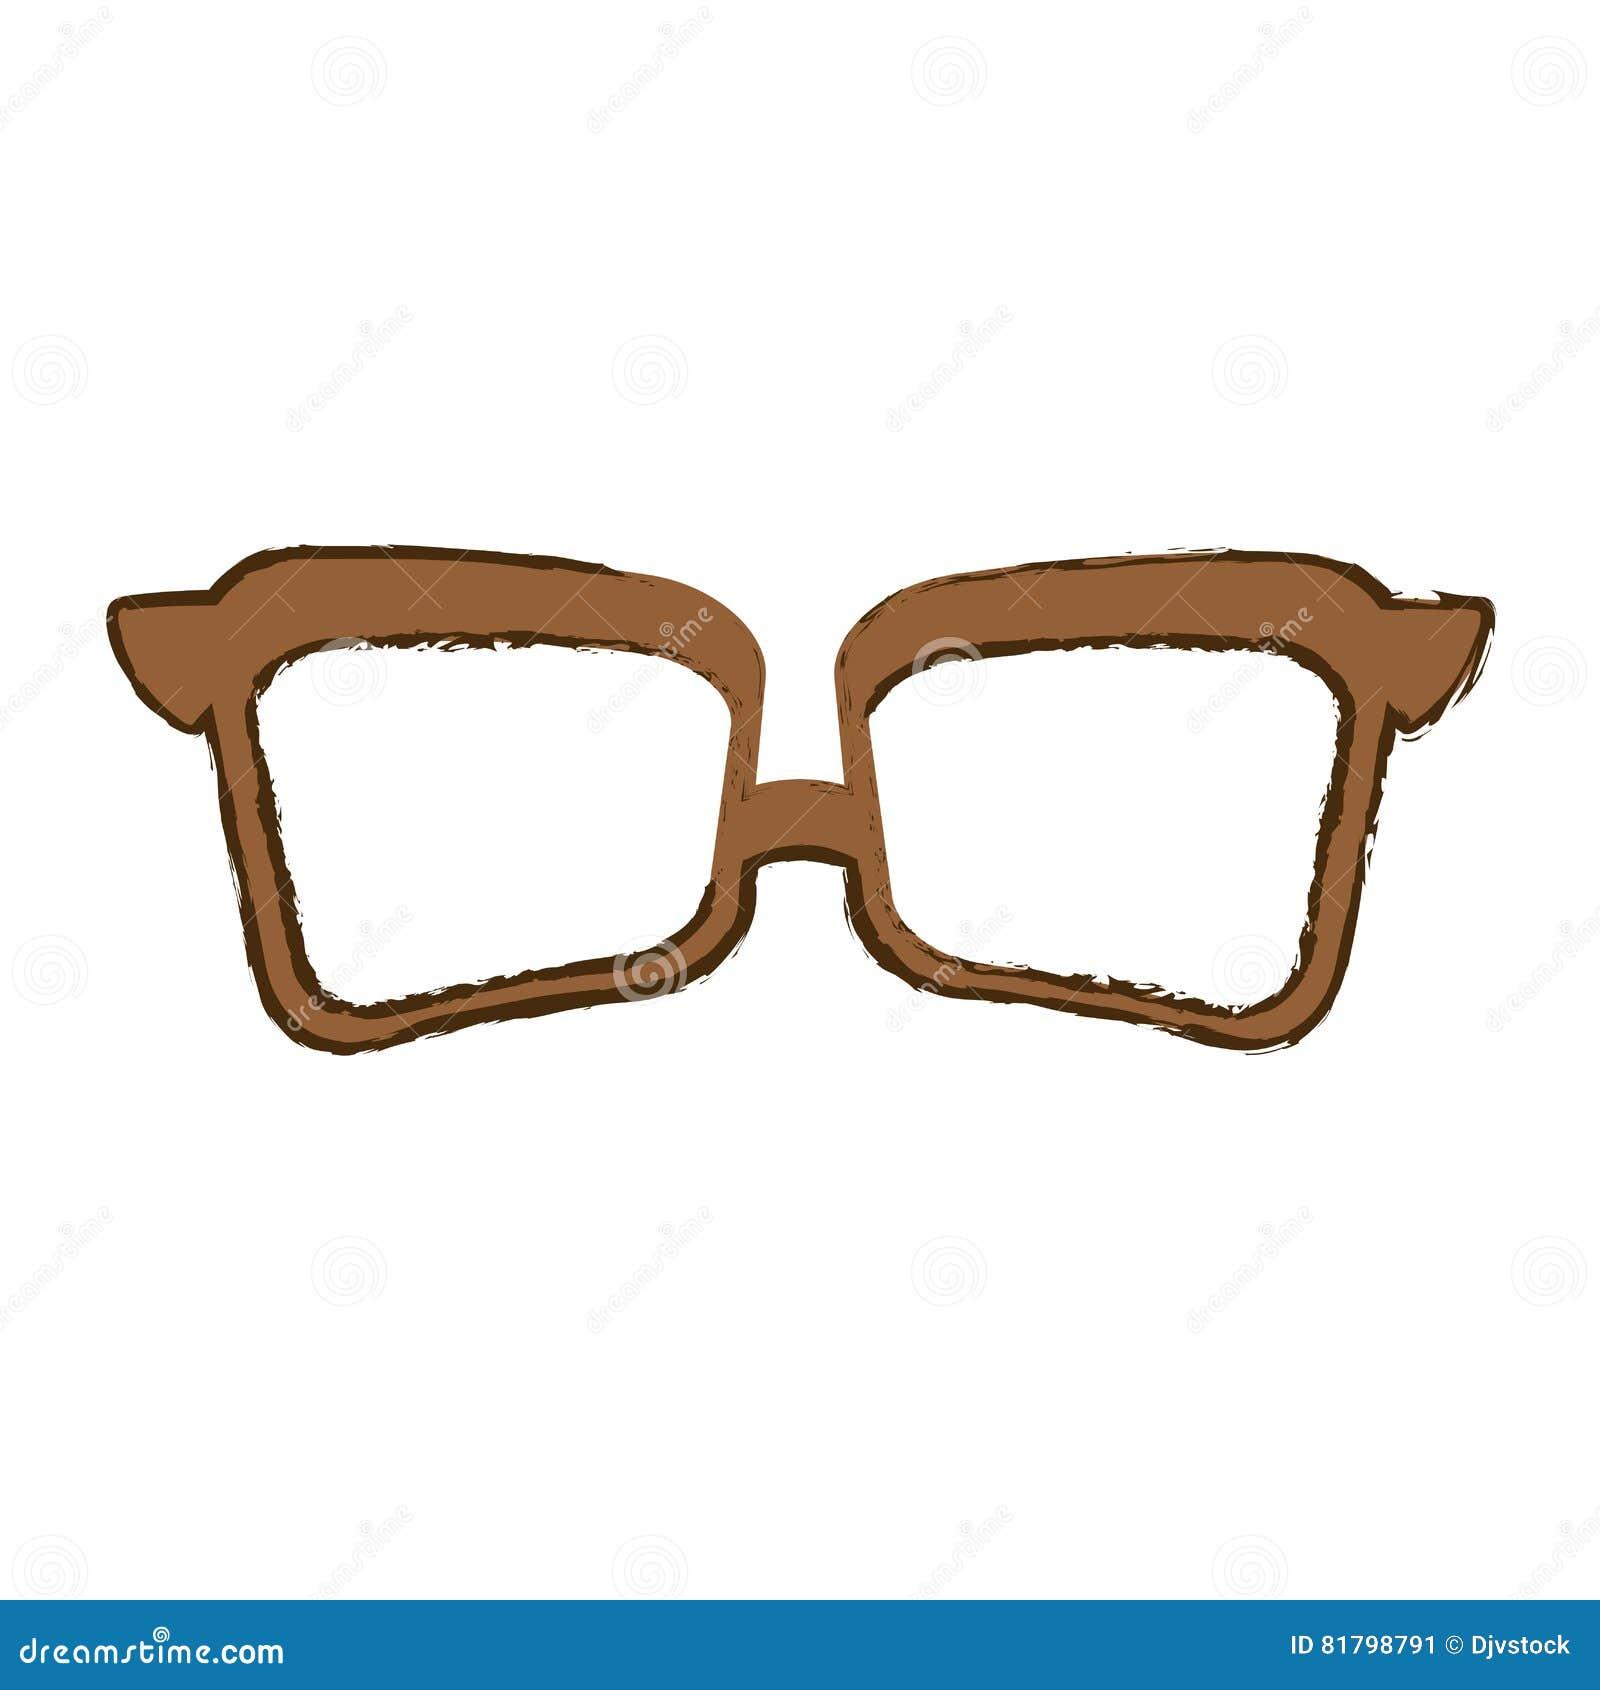 Glasses Vintage Frame Icon Image Stock Vector - Illustration of ...